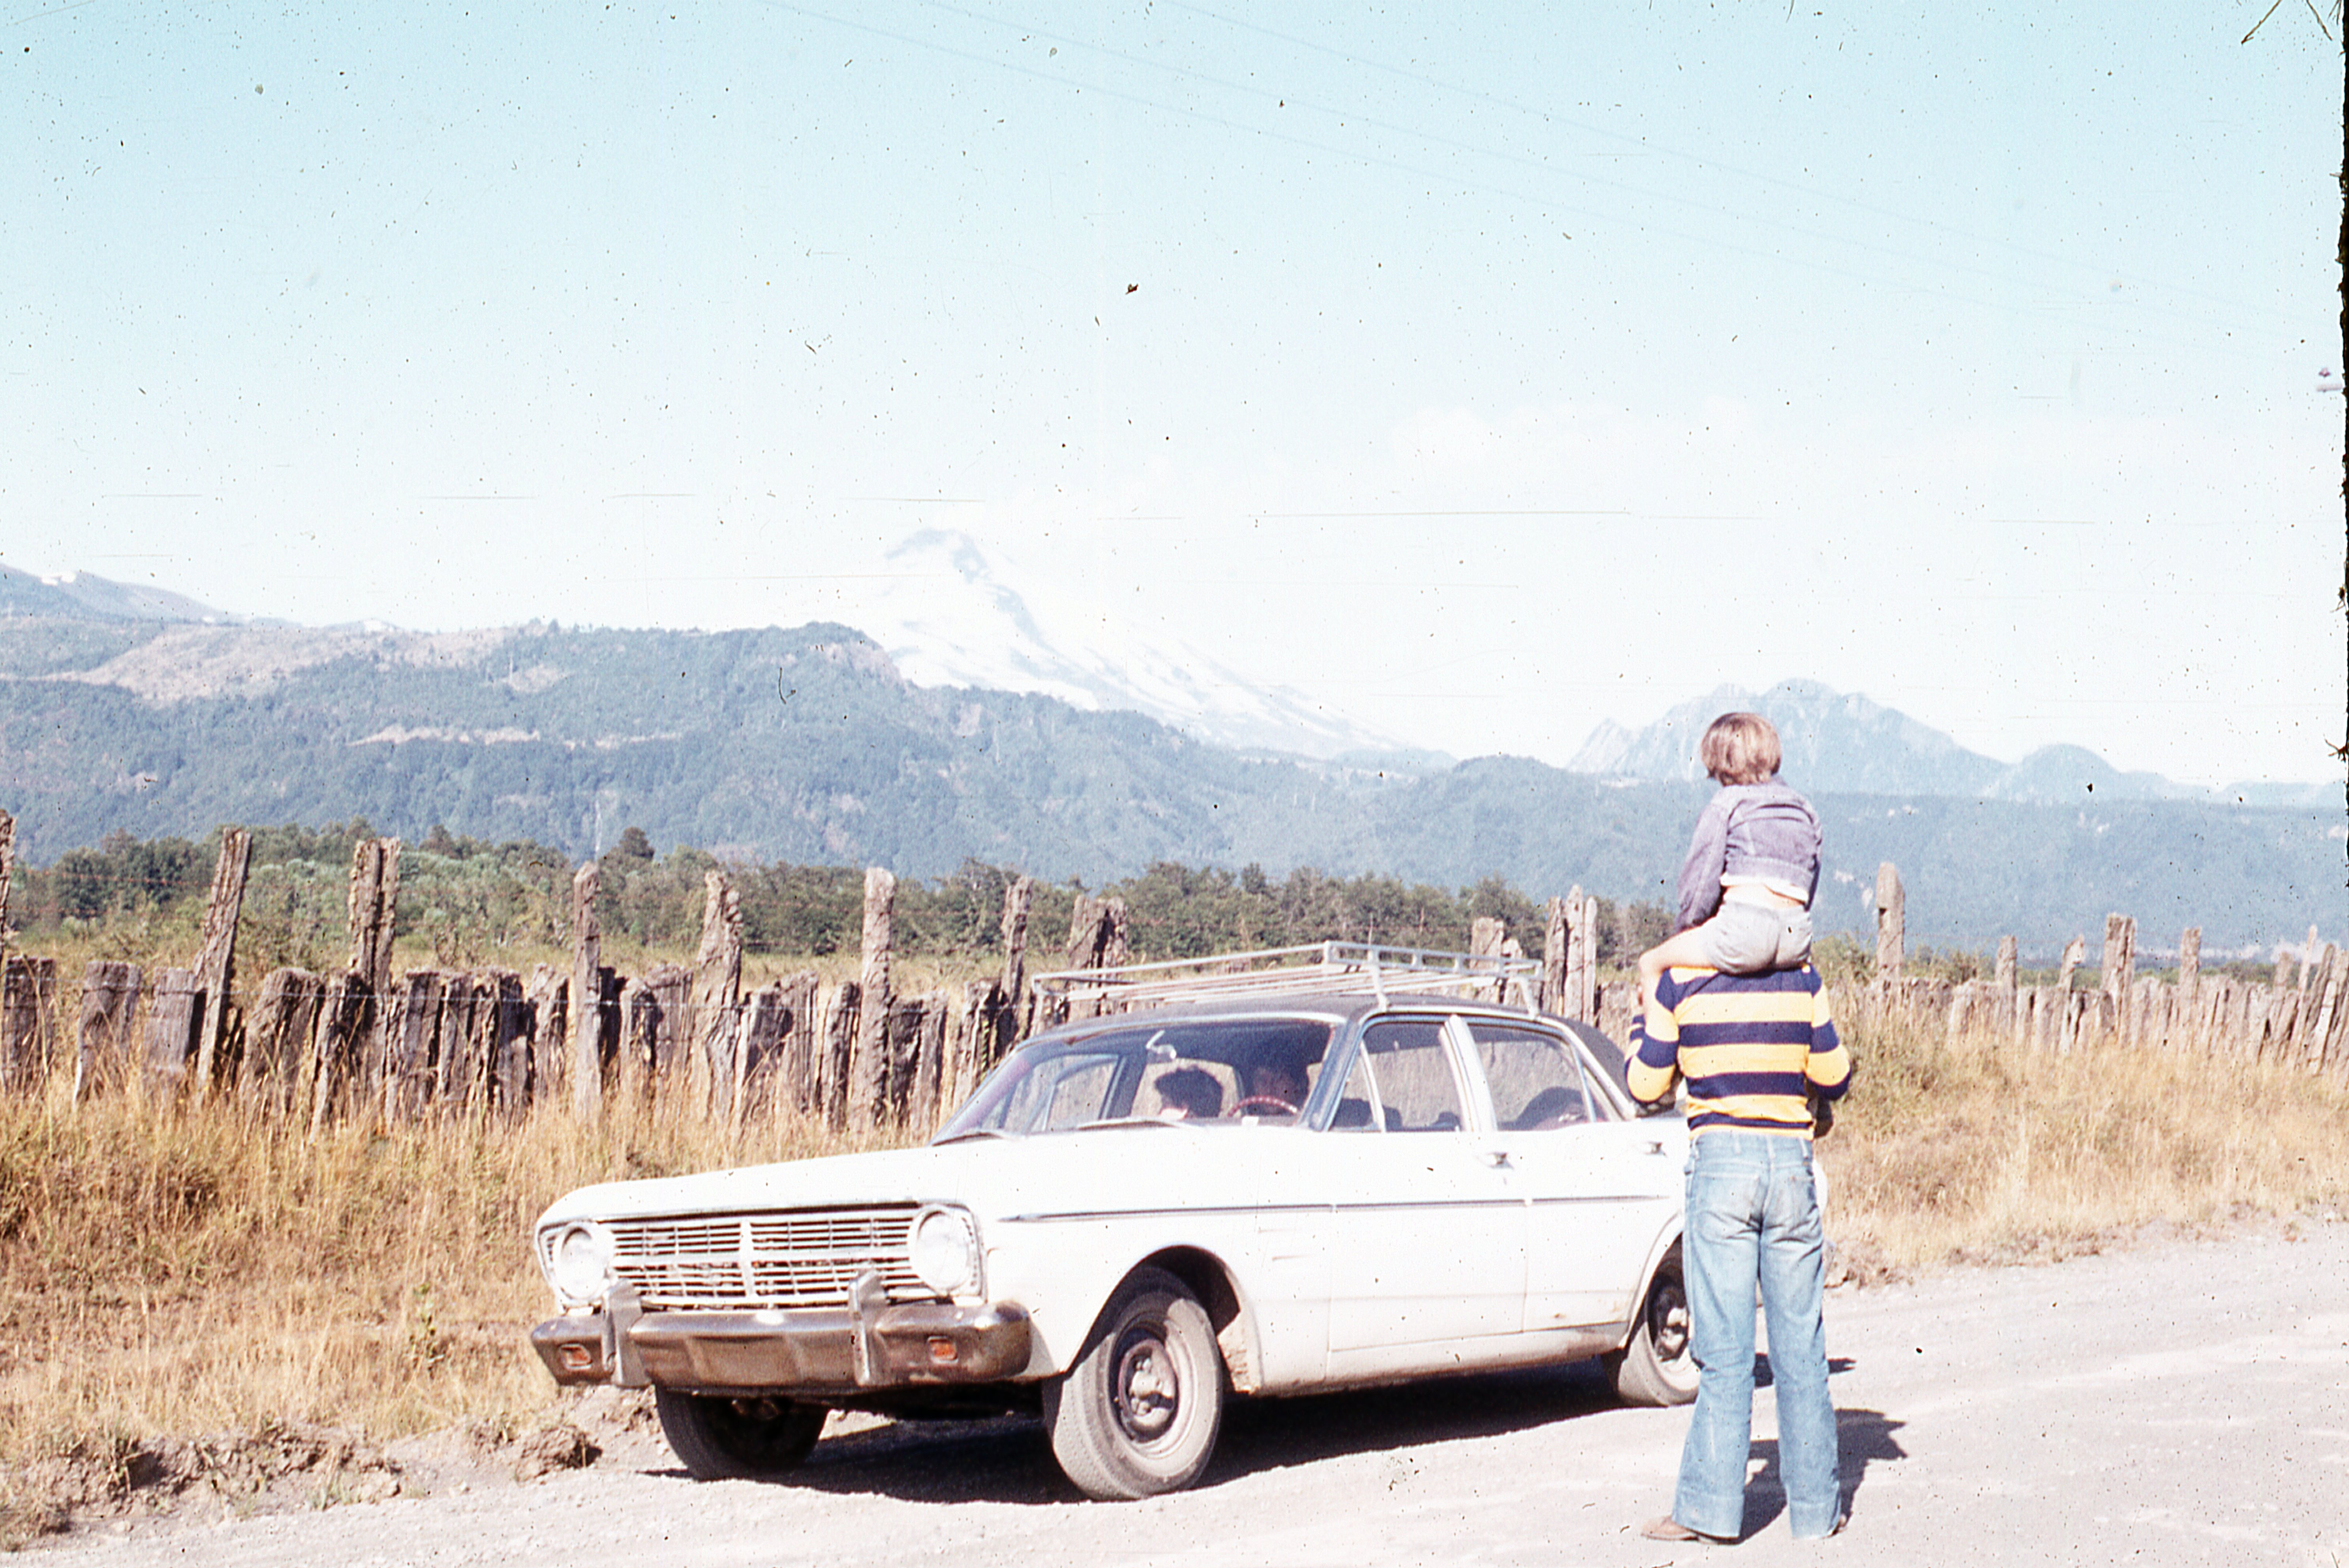 Enterreno - Fotos históricas de chile - fotos antiguas de Chile - Paso Tramen, 1977